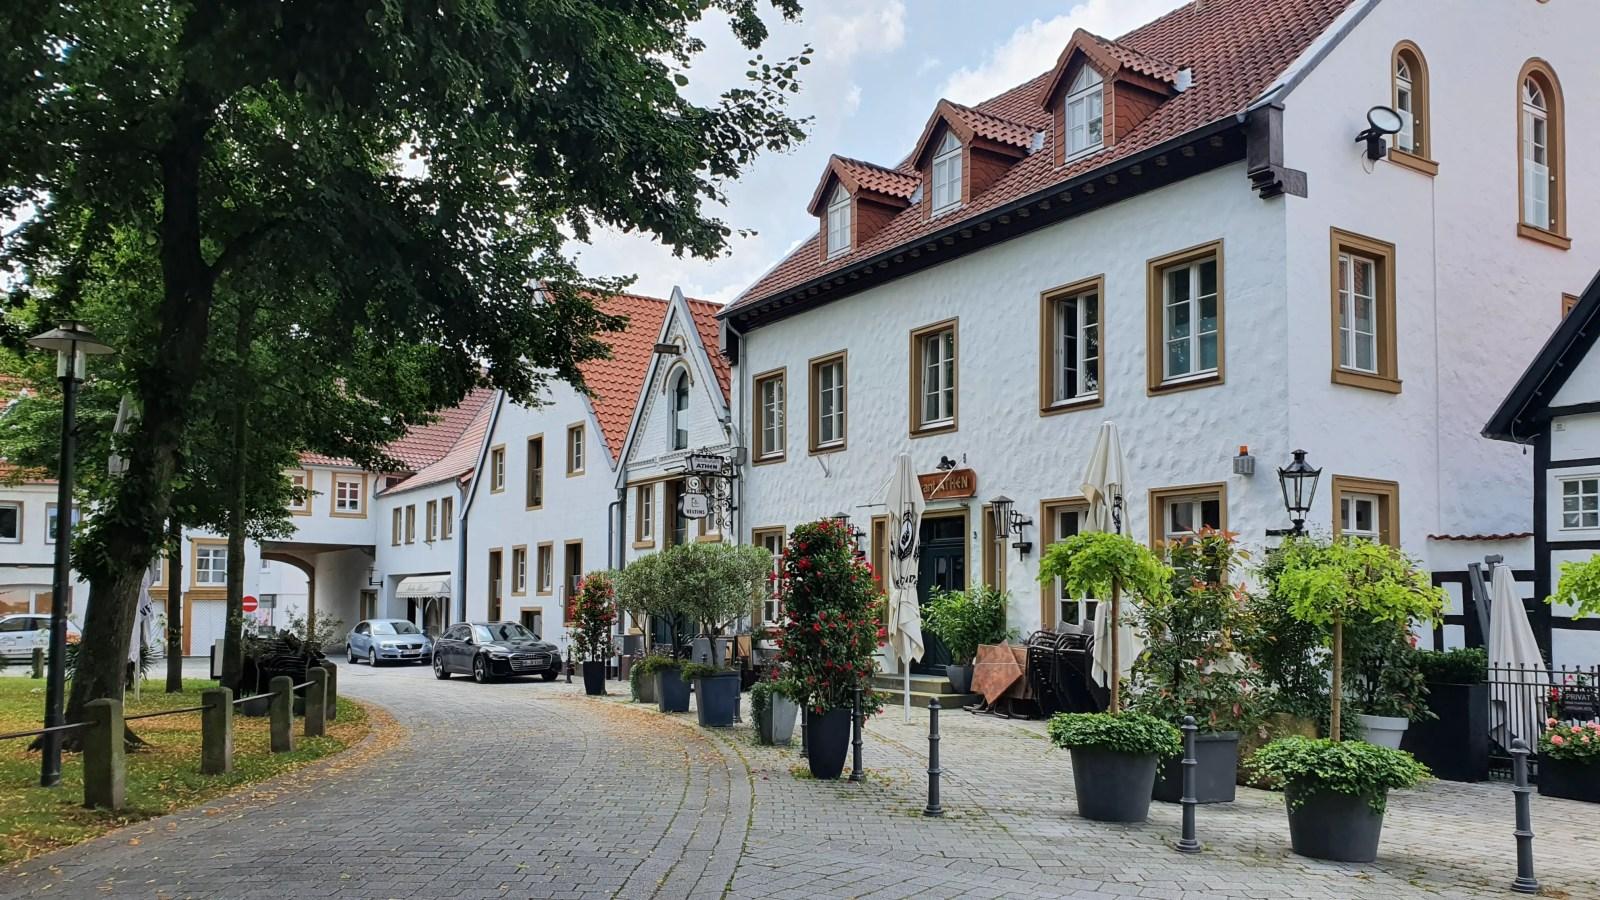 Sehenswürdigkeiten in Herzebrock-Clarholz, Klöster in Ostwestfalen, Sehenswert in Münsterland, Klöster in Ostwestfalen